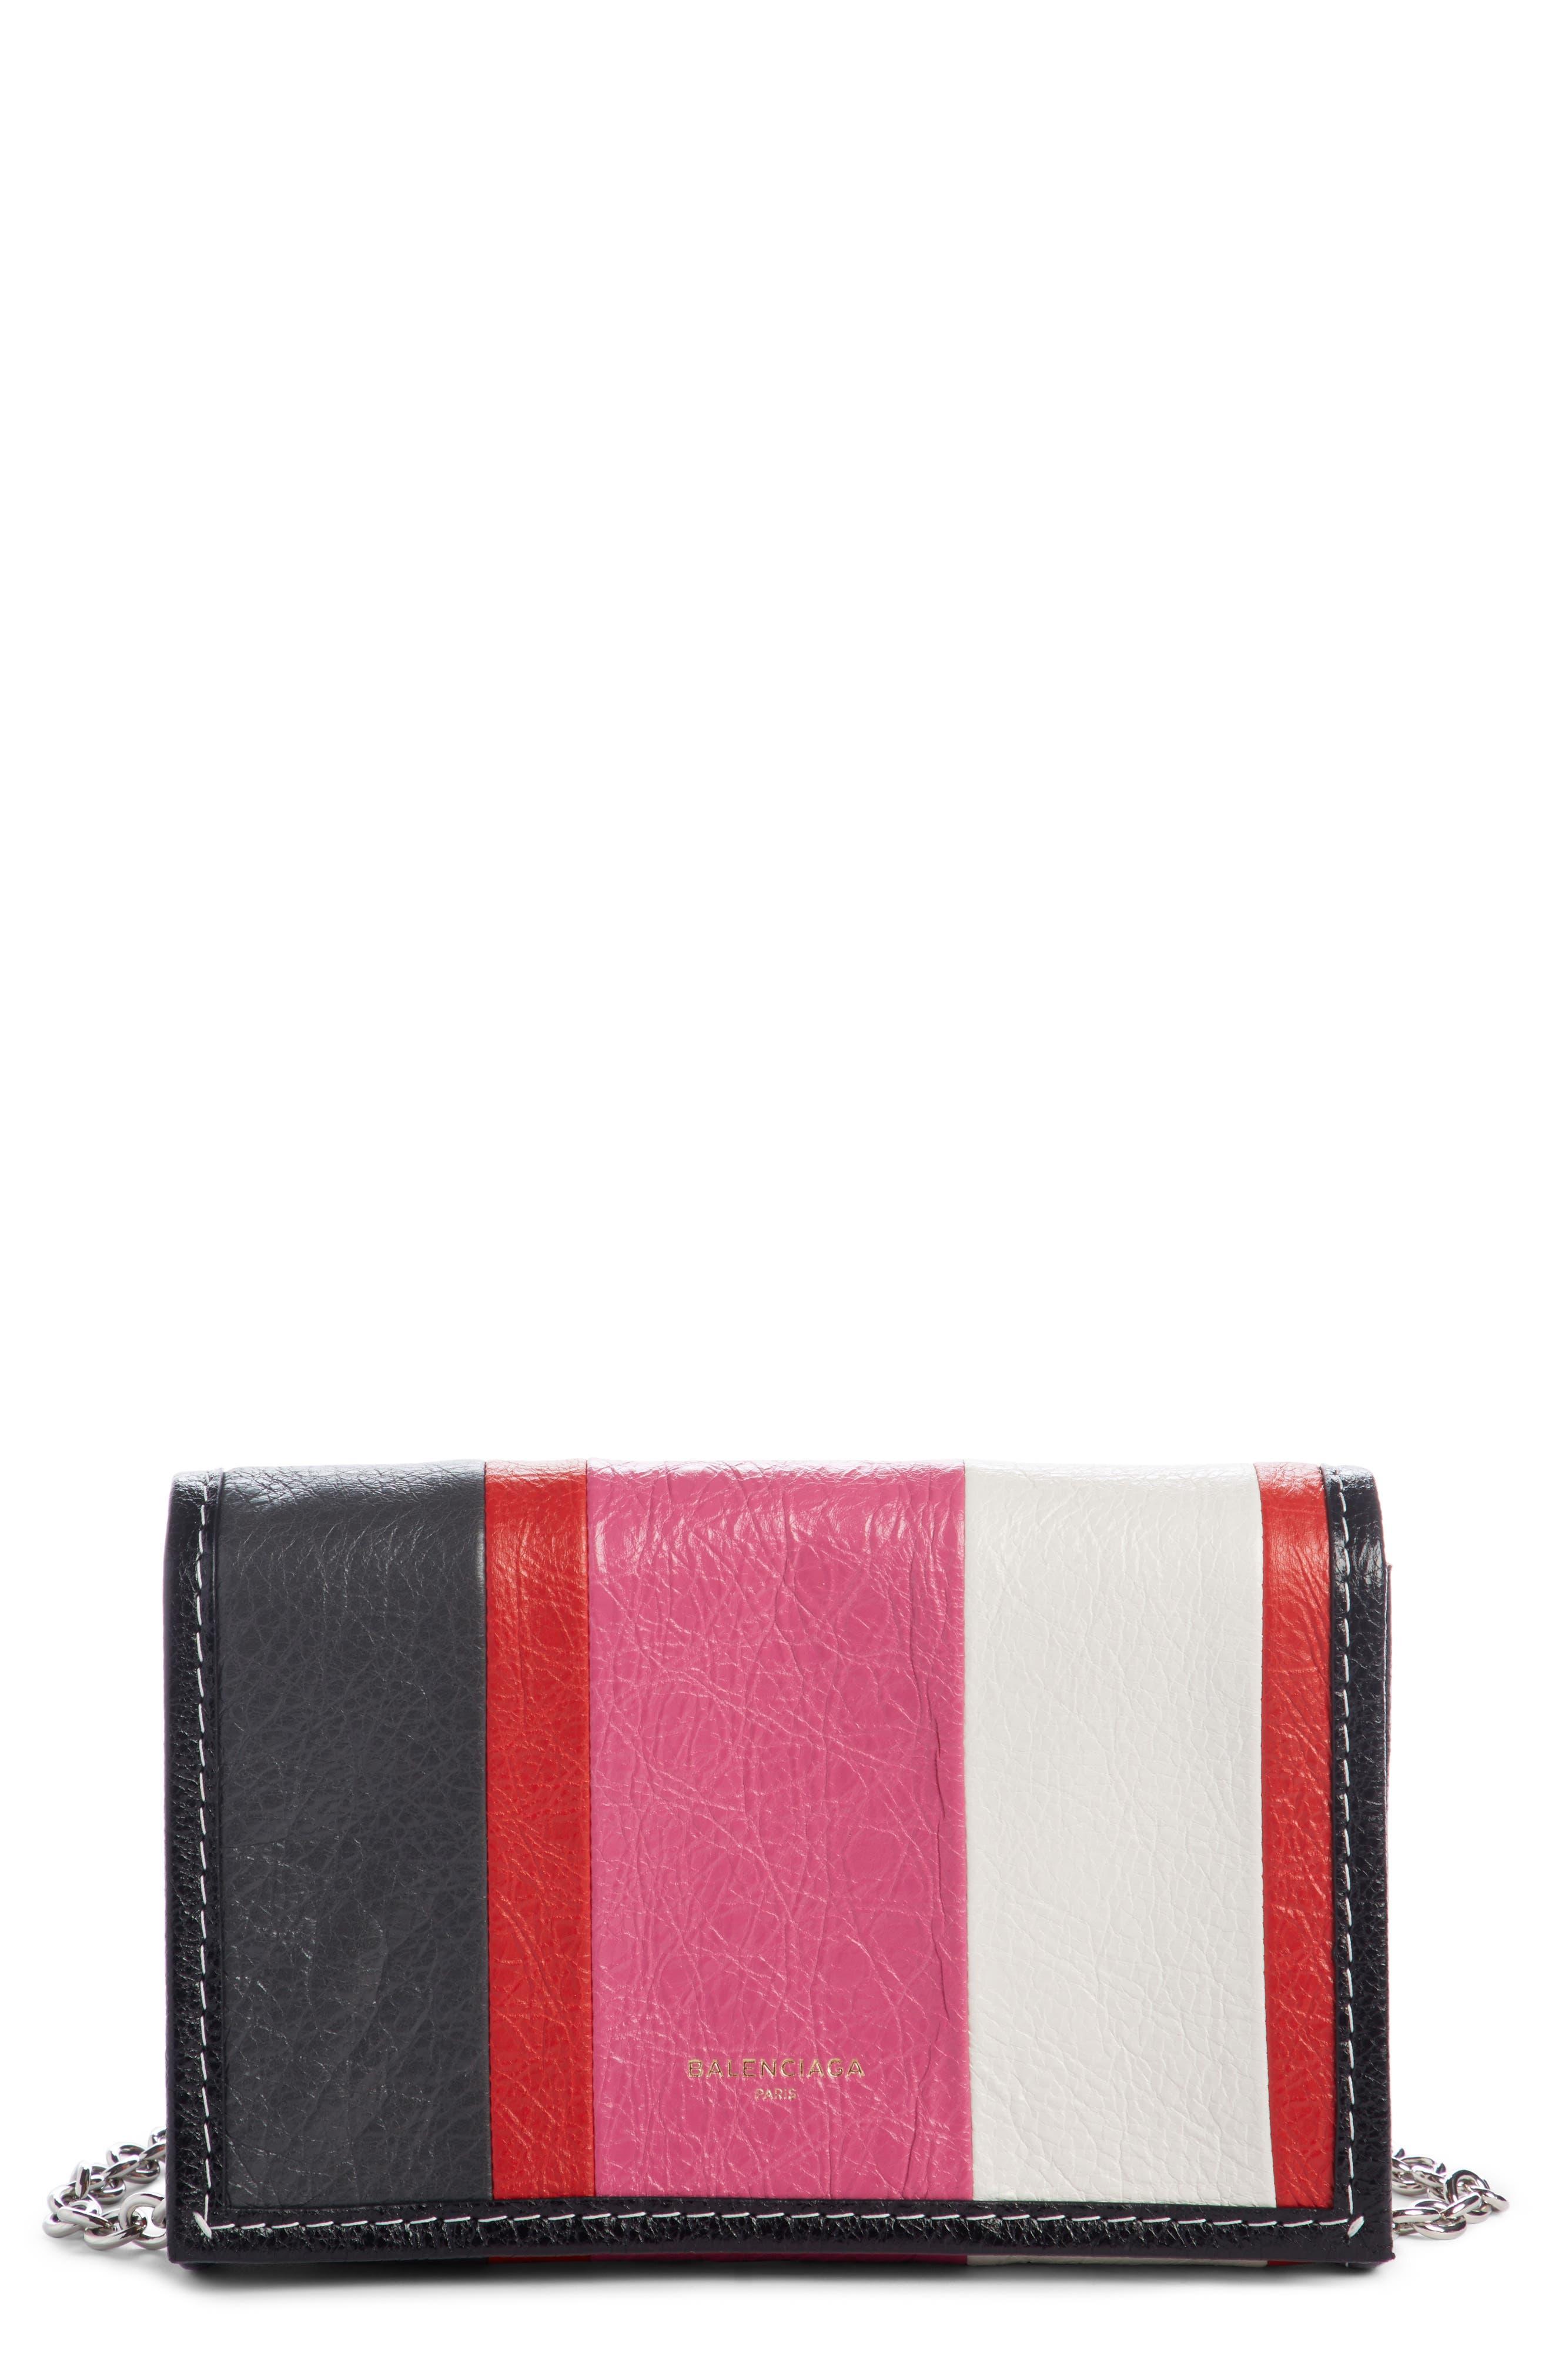 Bazar Leather Wallet on a Chain,                             Main thumbnail 1, color,                             Rose Gris Fssil Blu Noir Roug